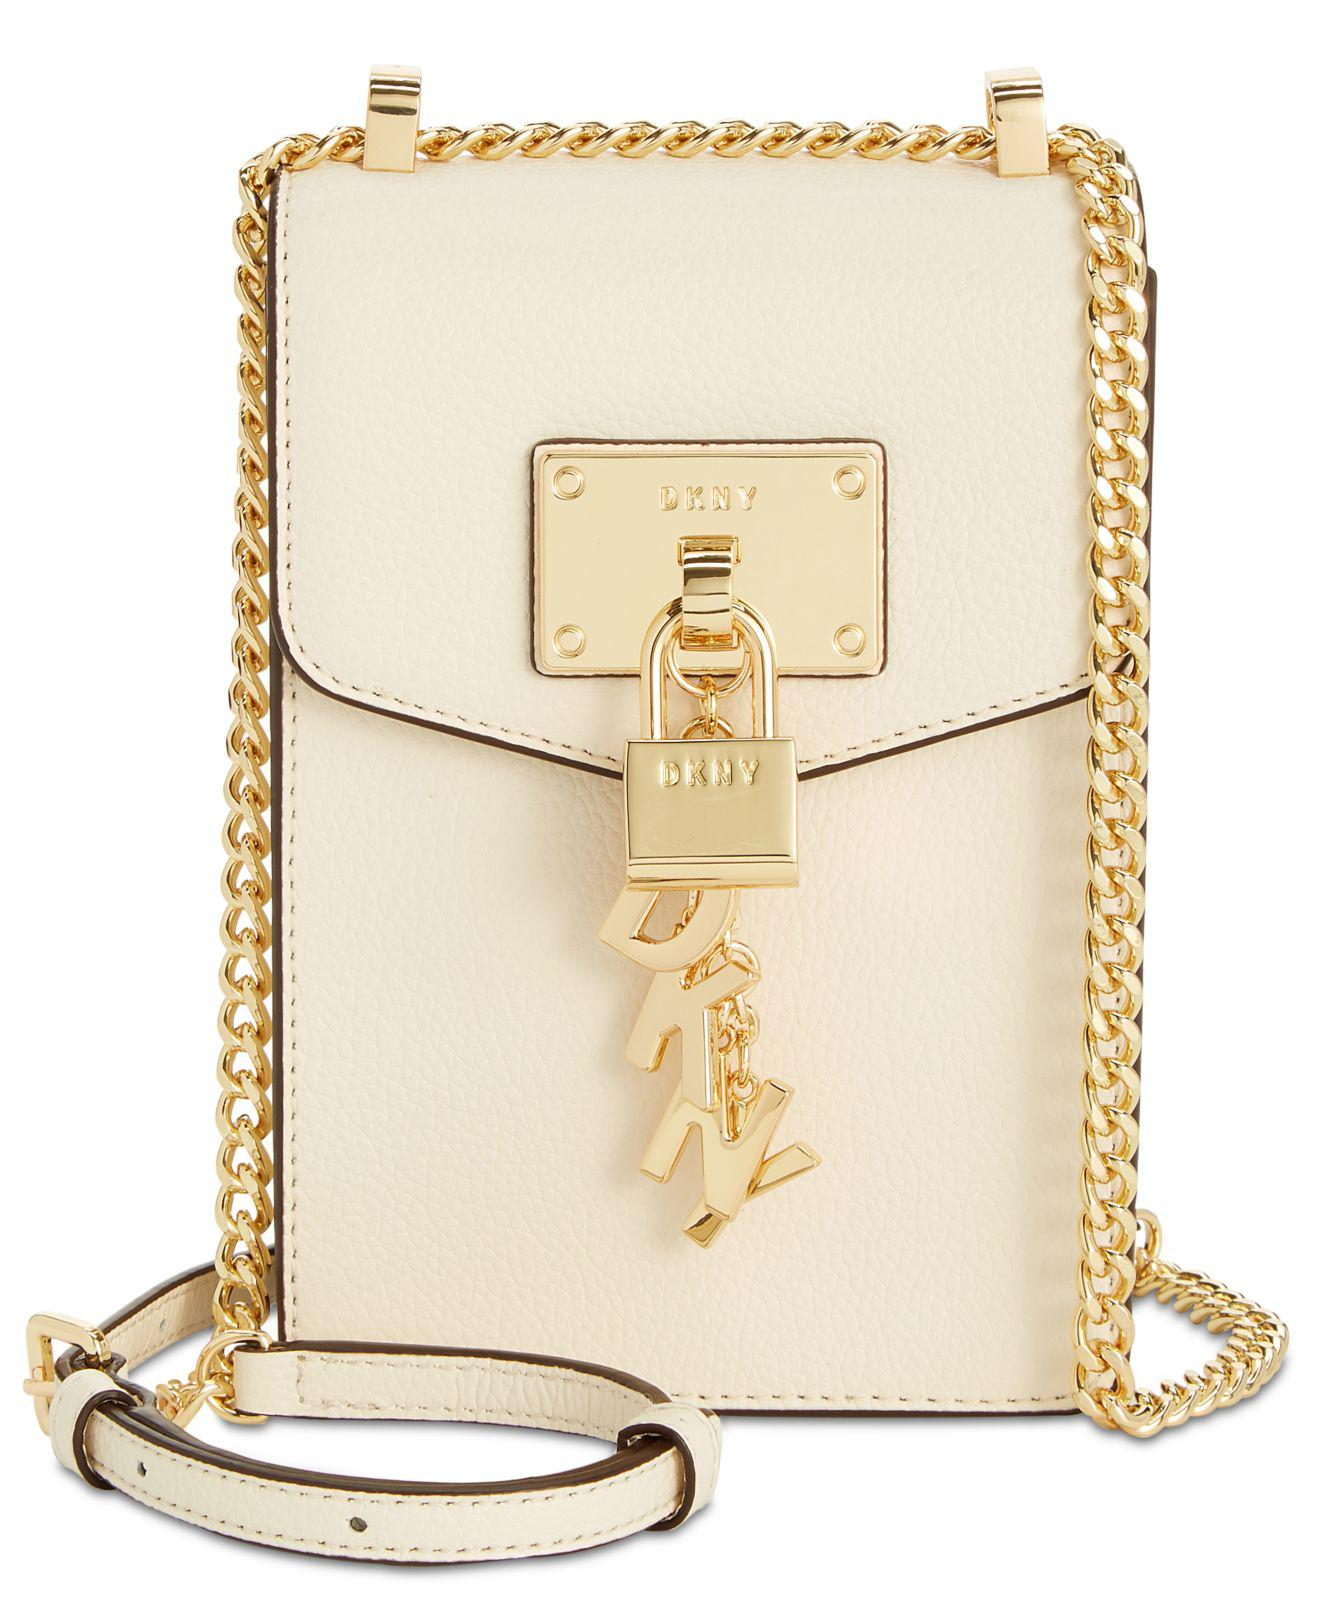 DKNY Elissa Pebbled Charm Chain Strap Crossbody